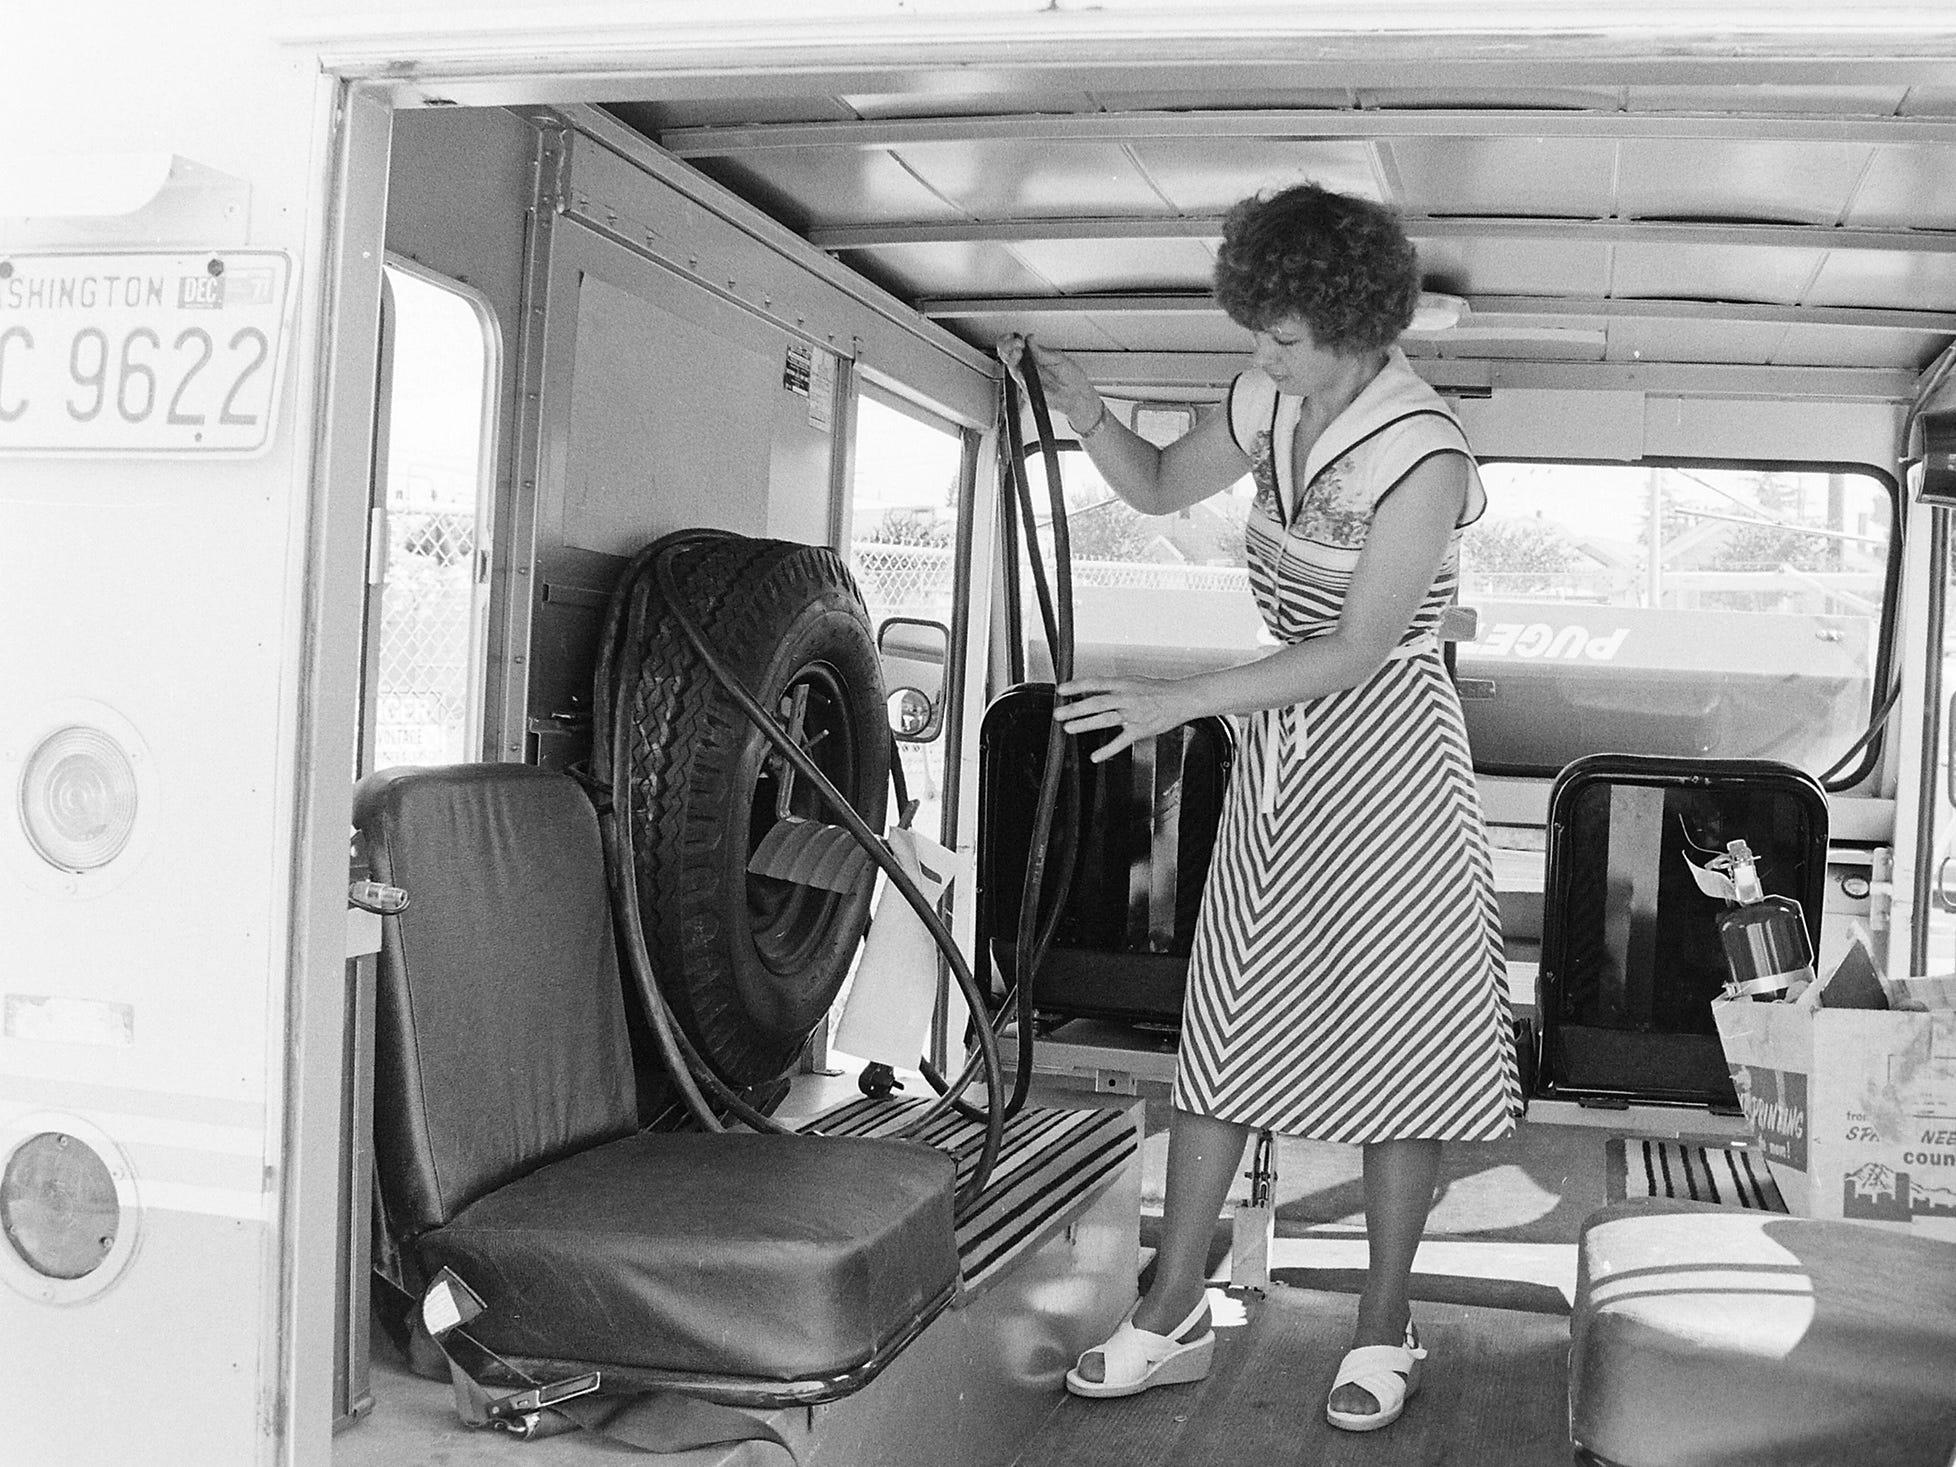 08/26/77 Electric Van: Voltswagon